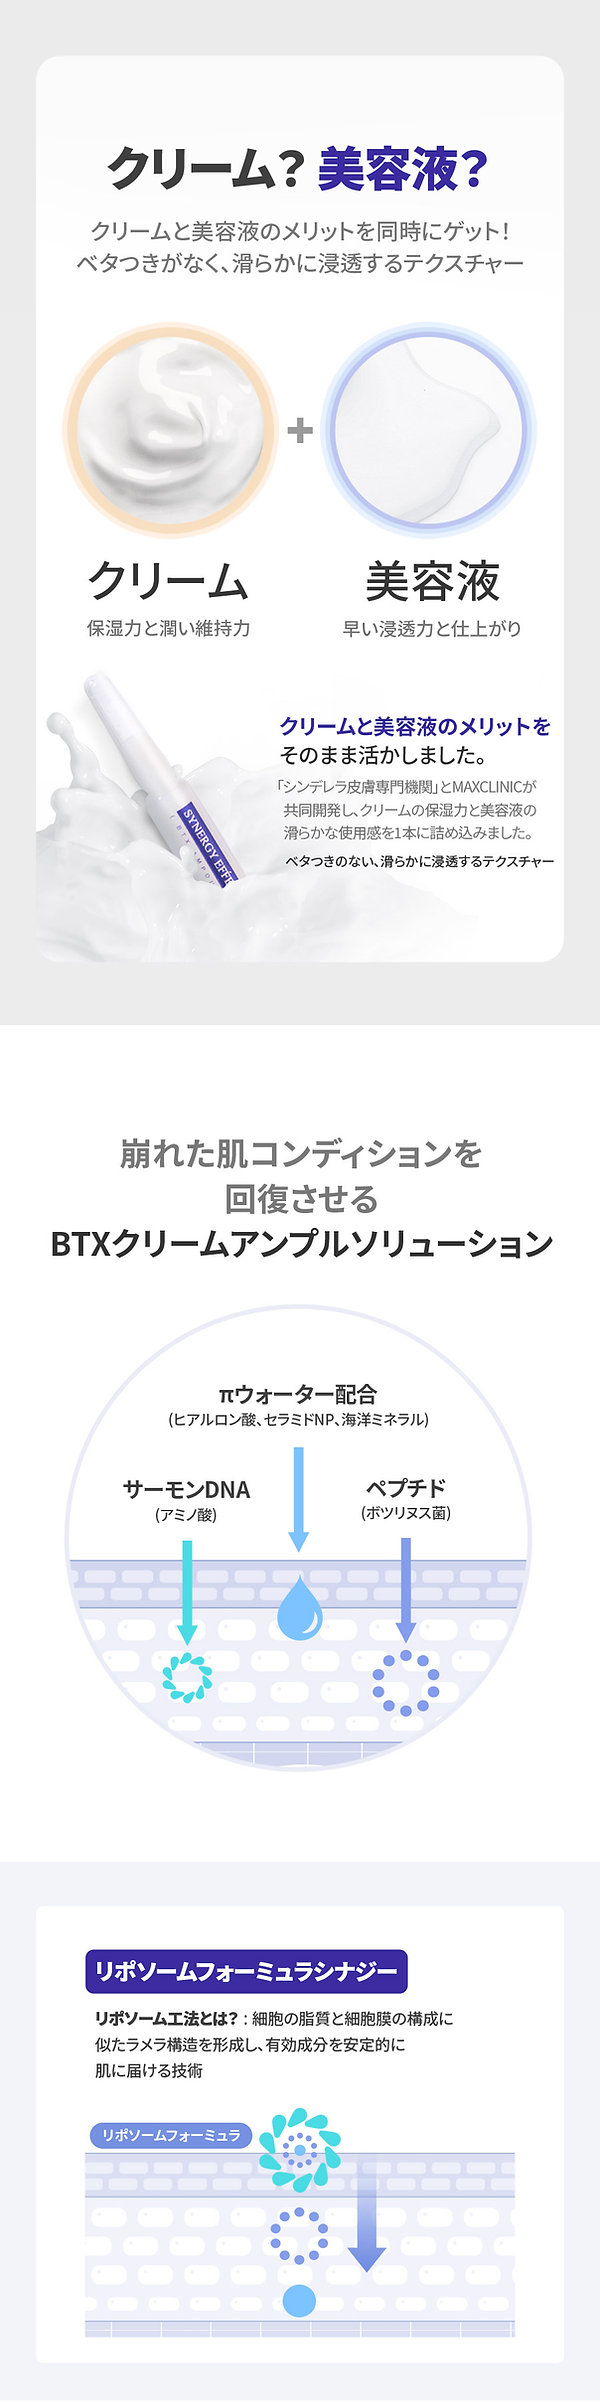 btx2021_creamample-(일어-용량-작)_03.jpg